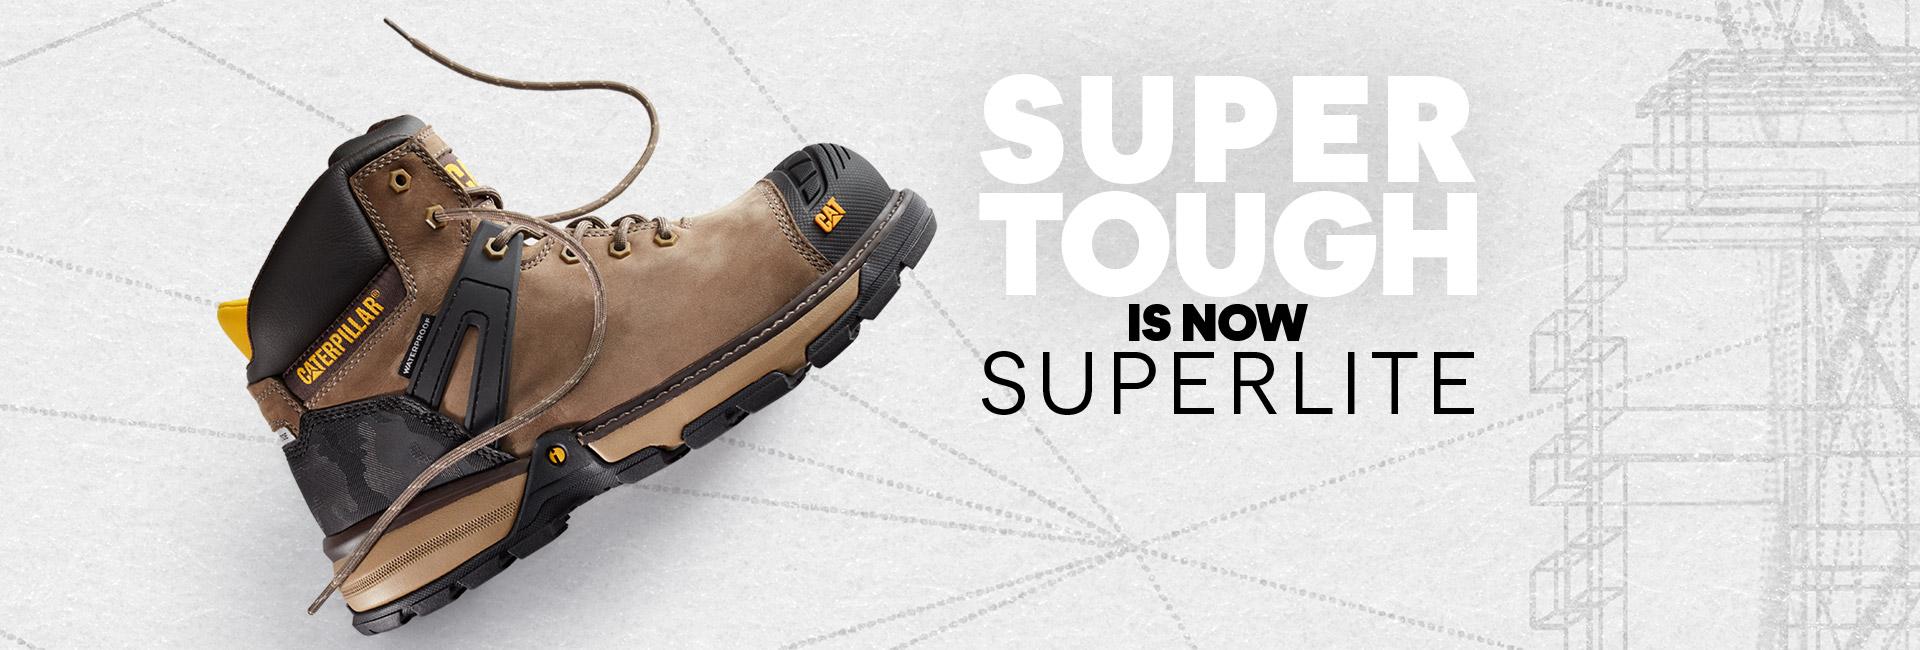 Super Tough is now Superlite.